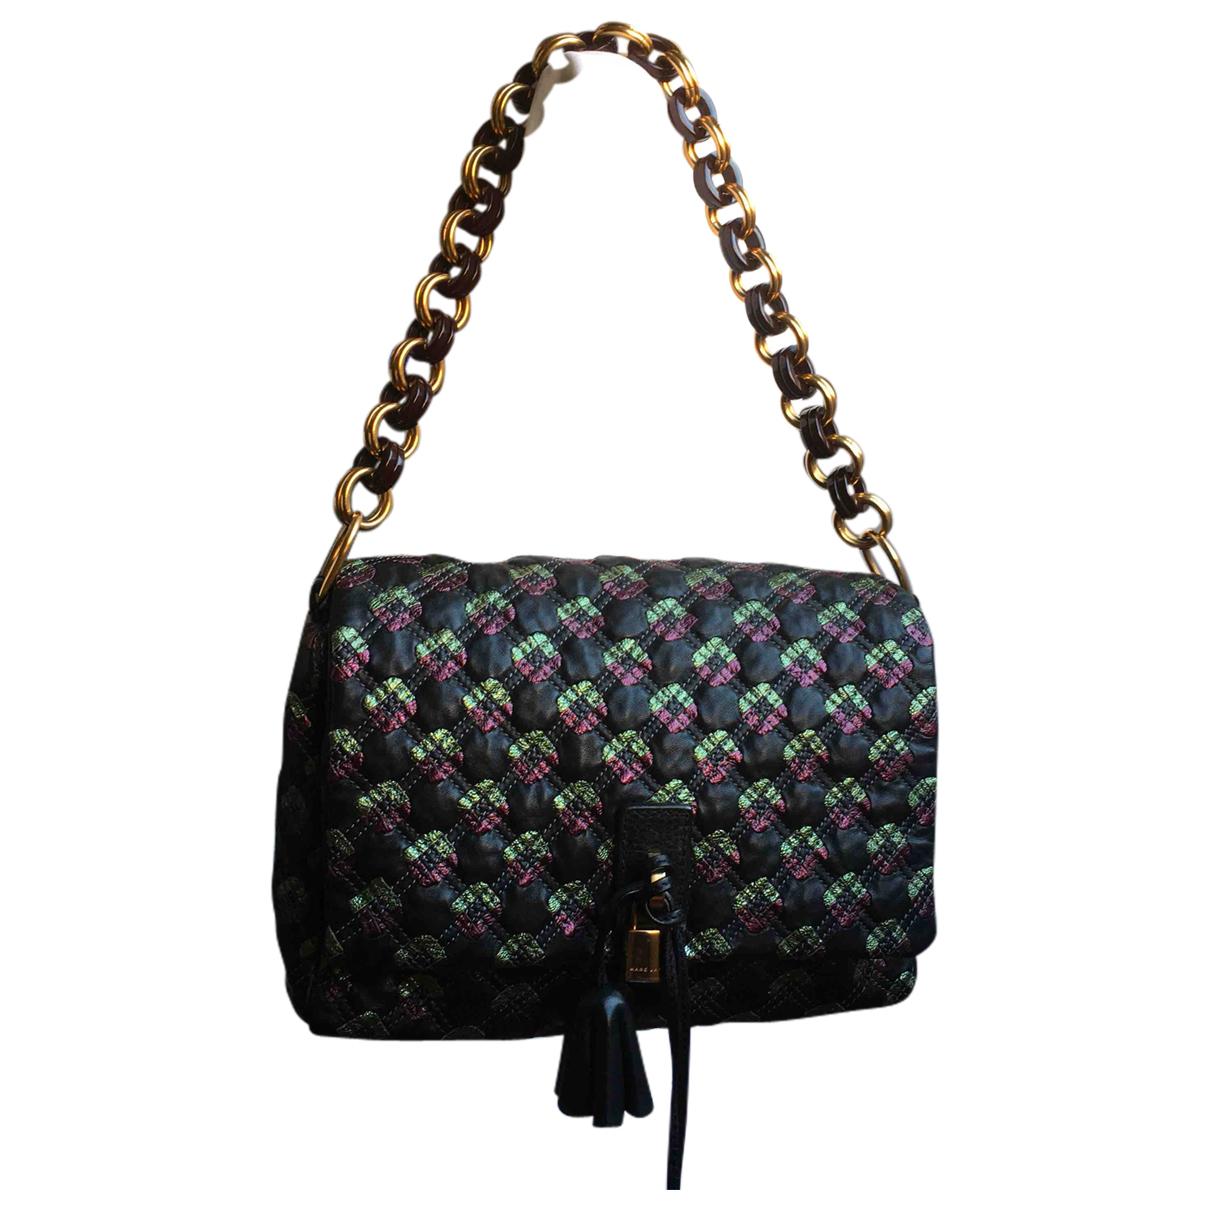 Marc Jacobs \N Multicolour Leather handbag for Women \N